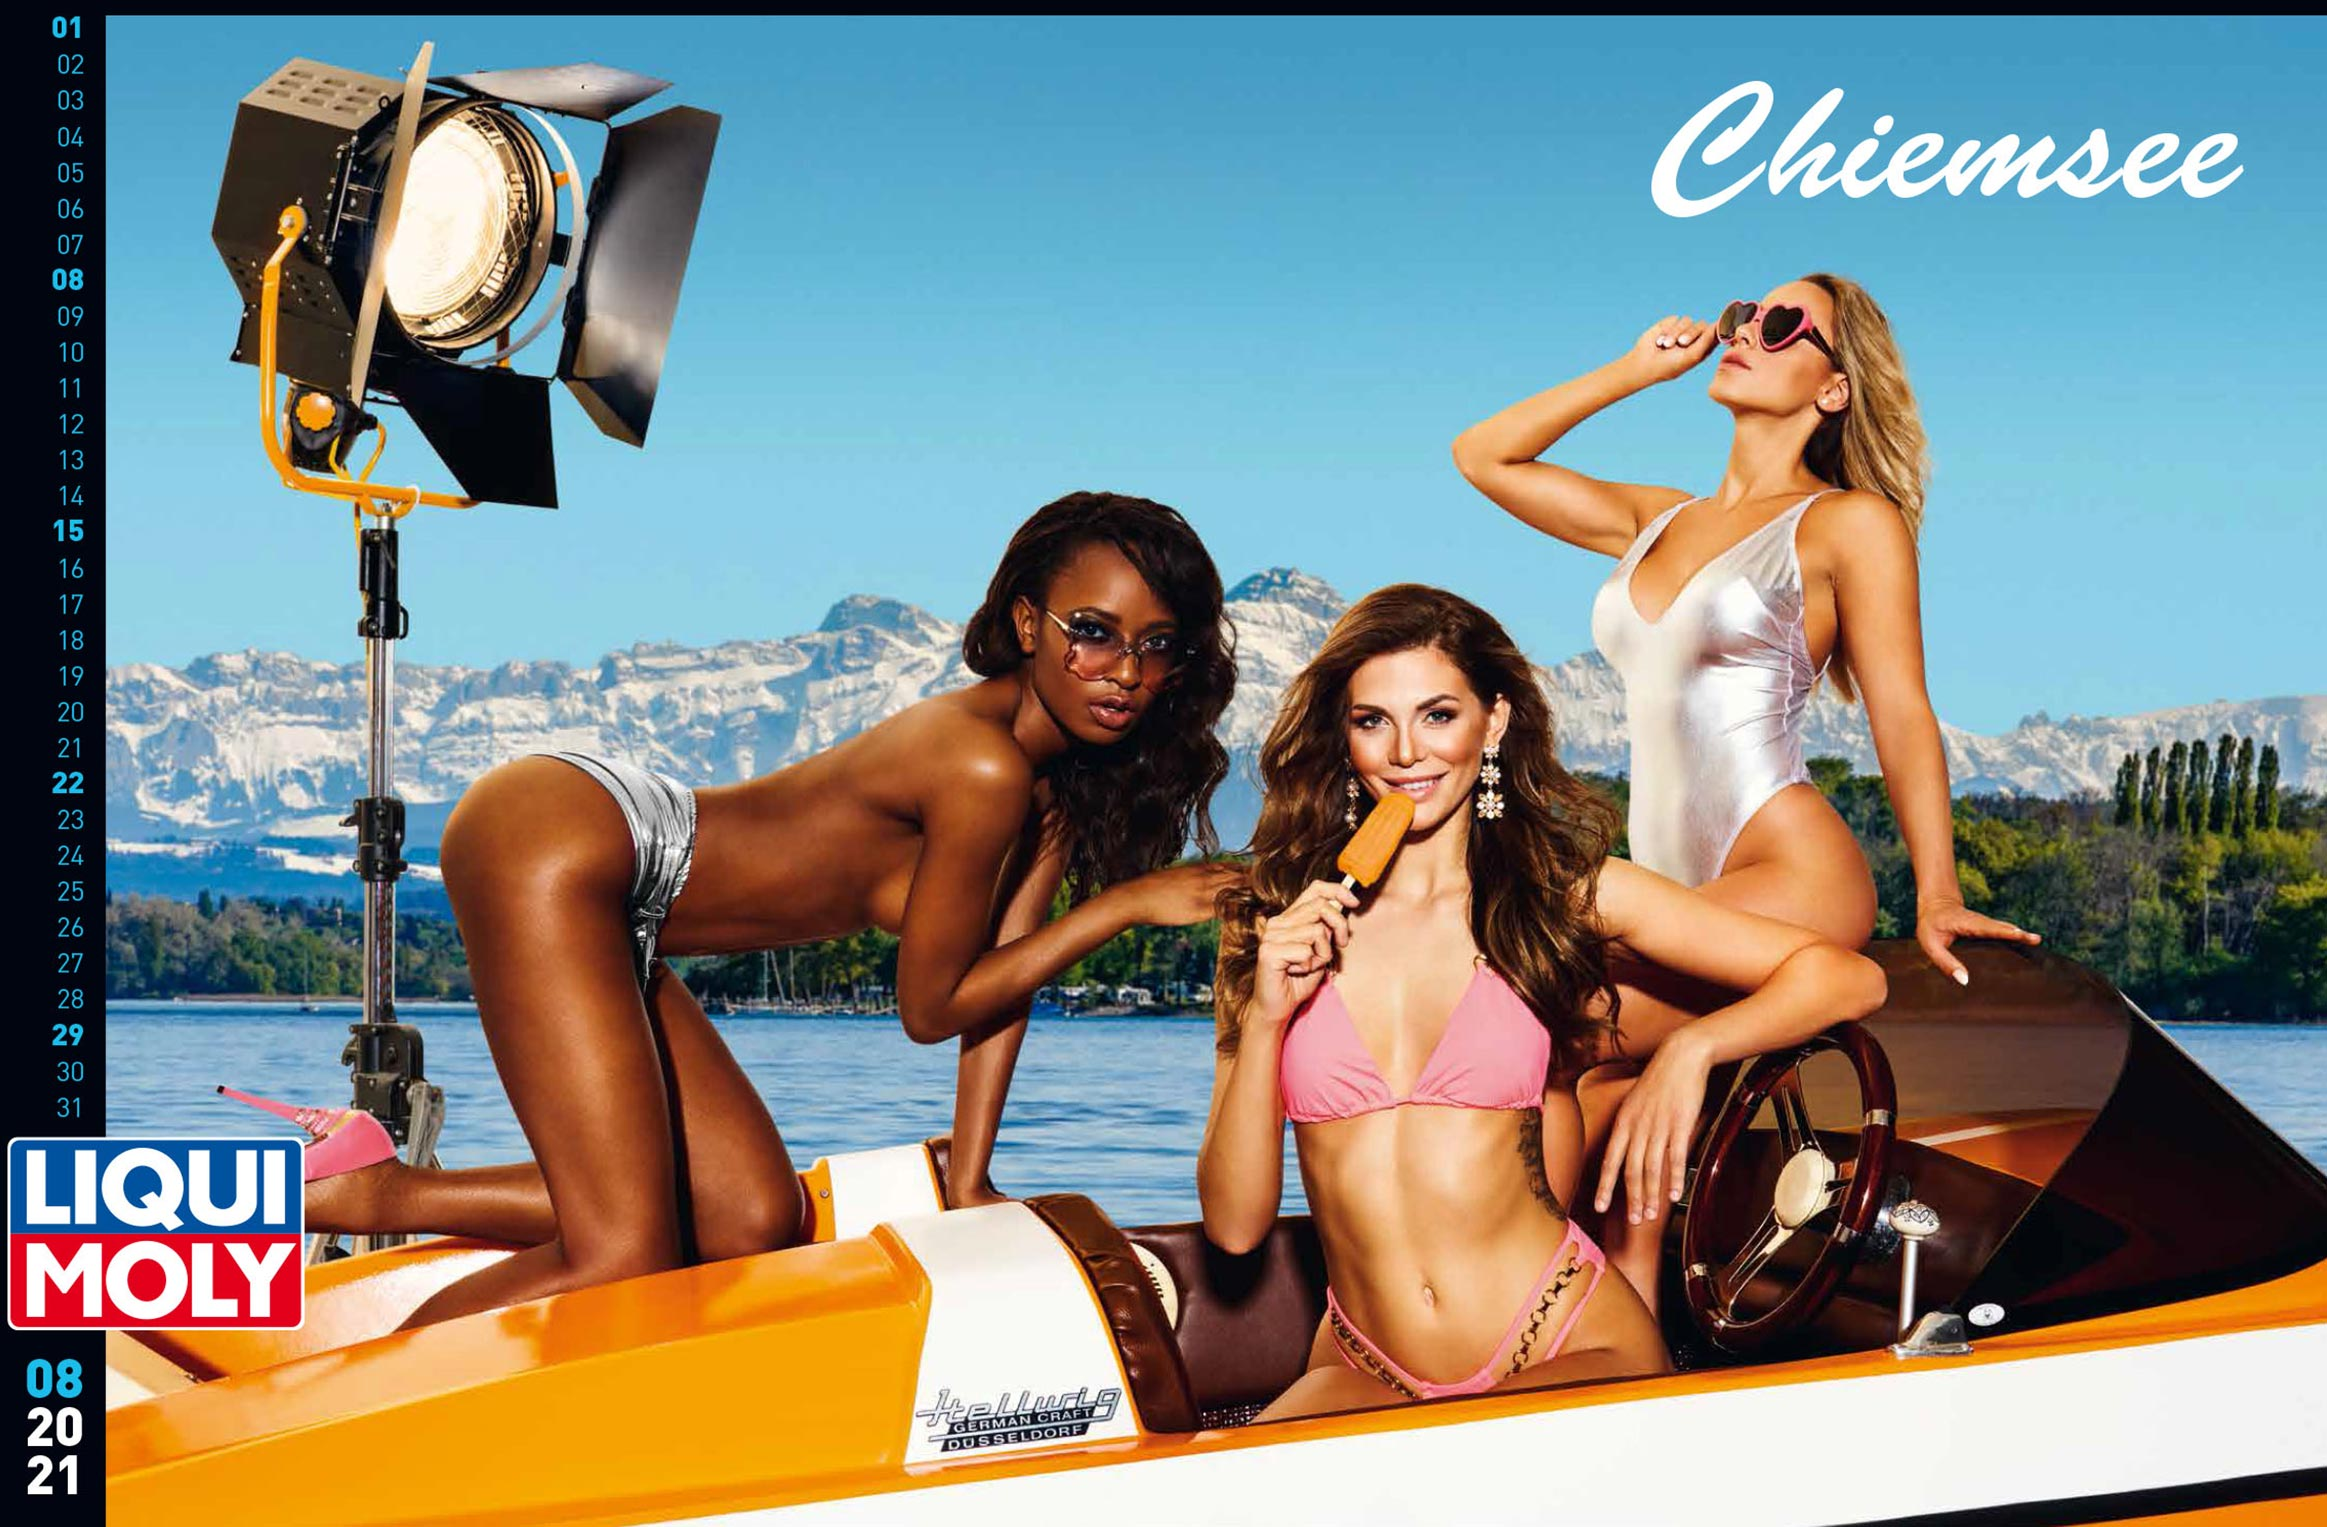 Фирменный календарь с девушками автоконцерна Liqui Moly на 2021 год / август 2021